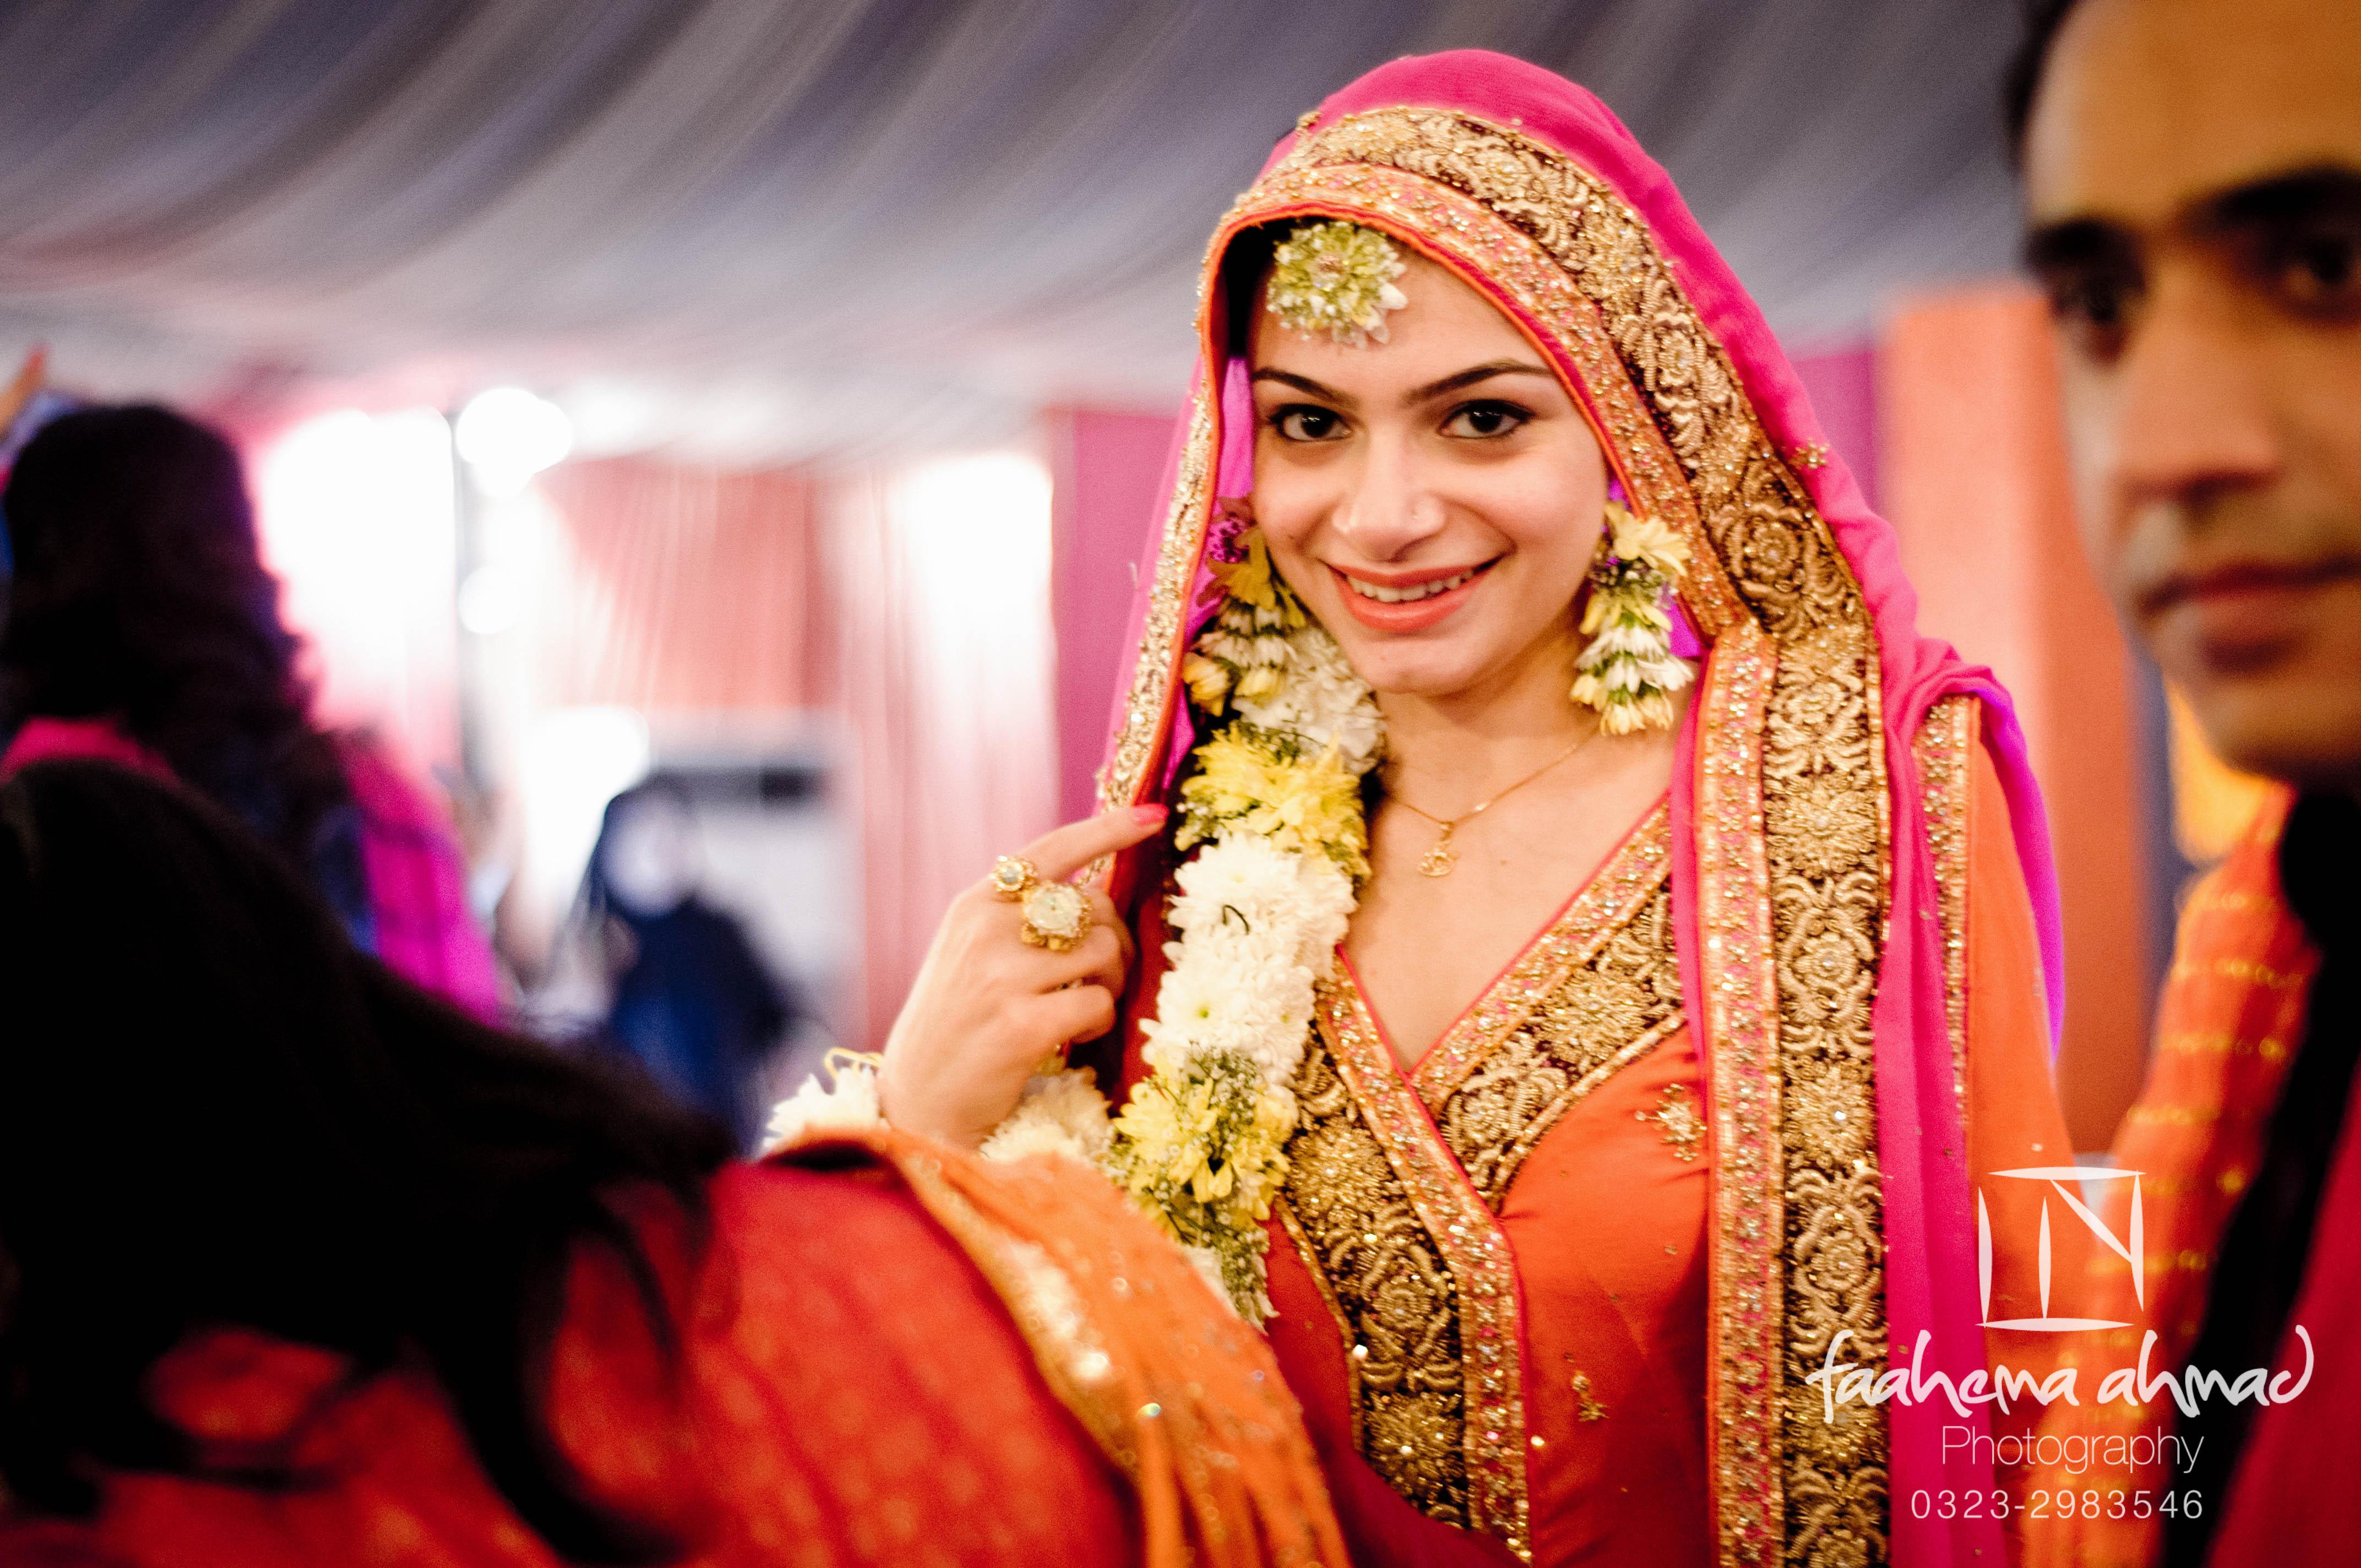 Wedding Photography In Karachi: All Things Karachi Weddings